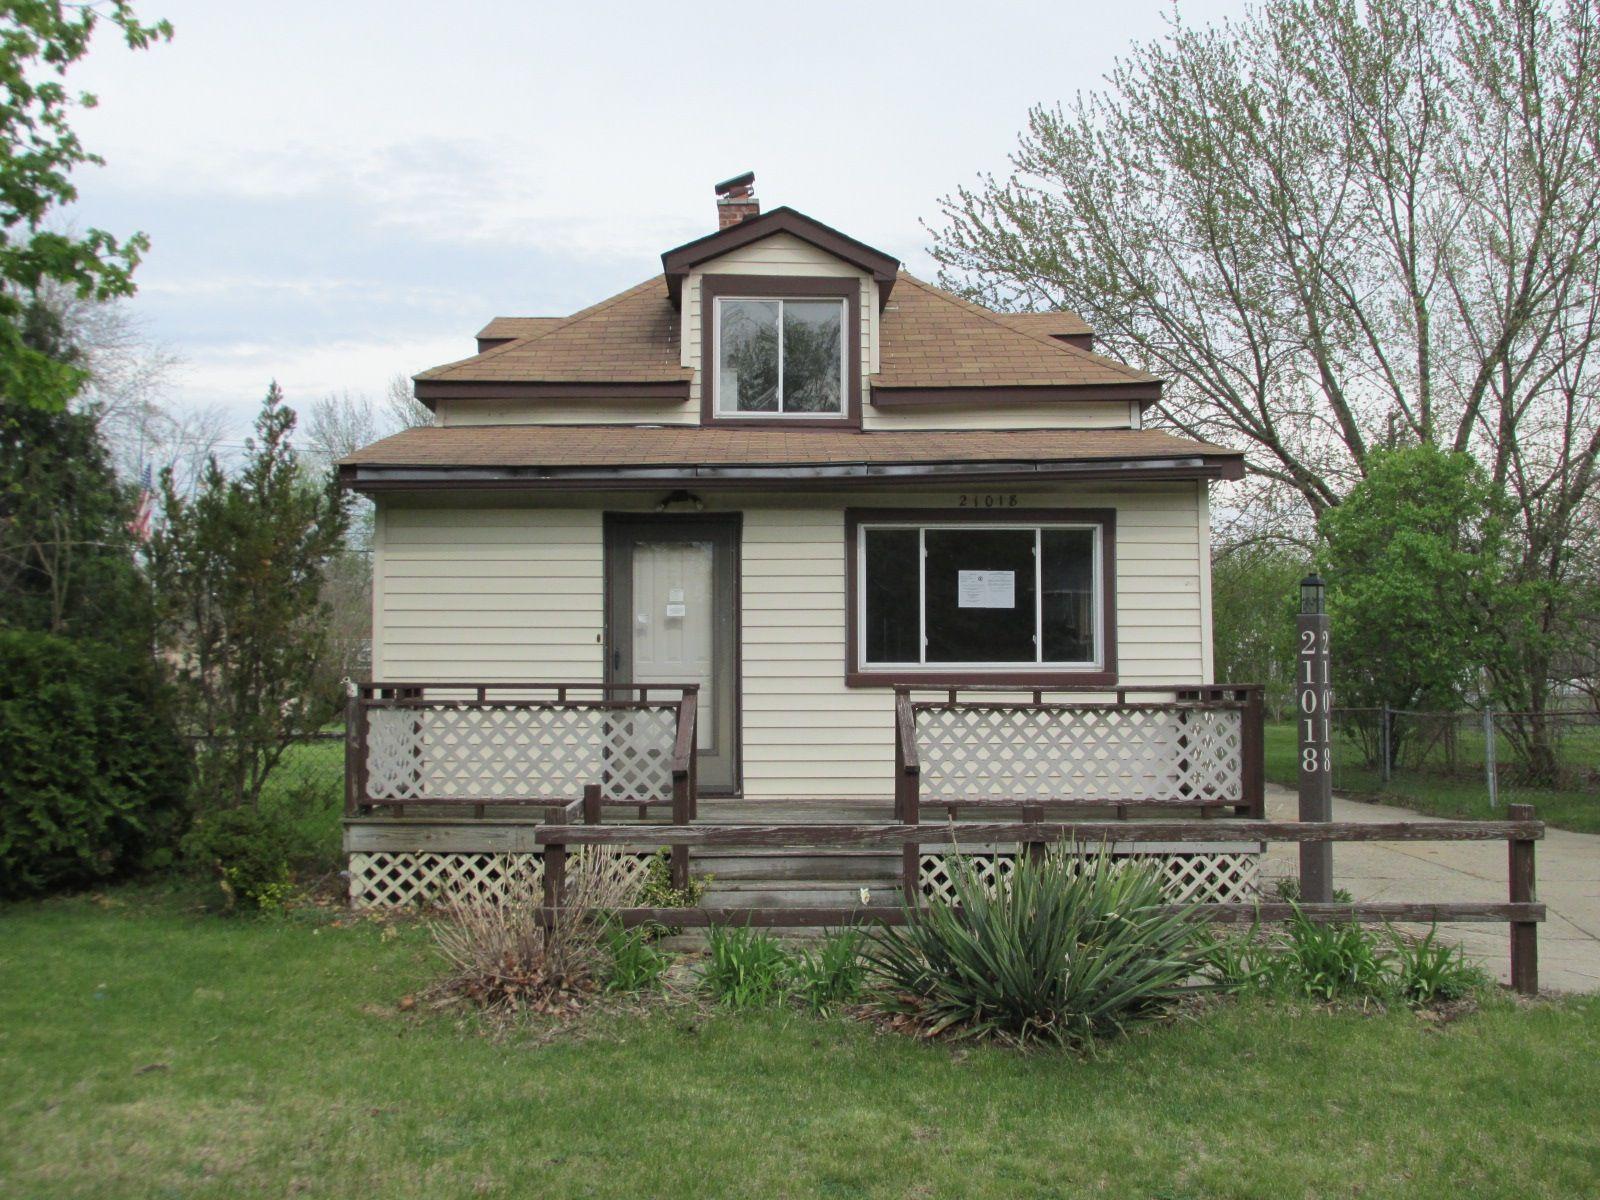 21018 Negaunee St, Southfield, MI 48033 Hud homes, Pass